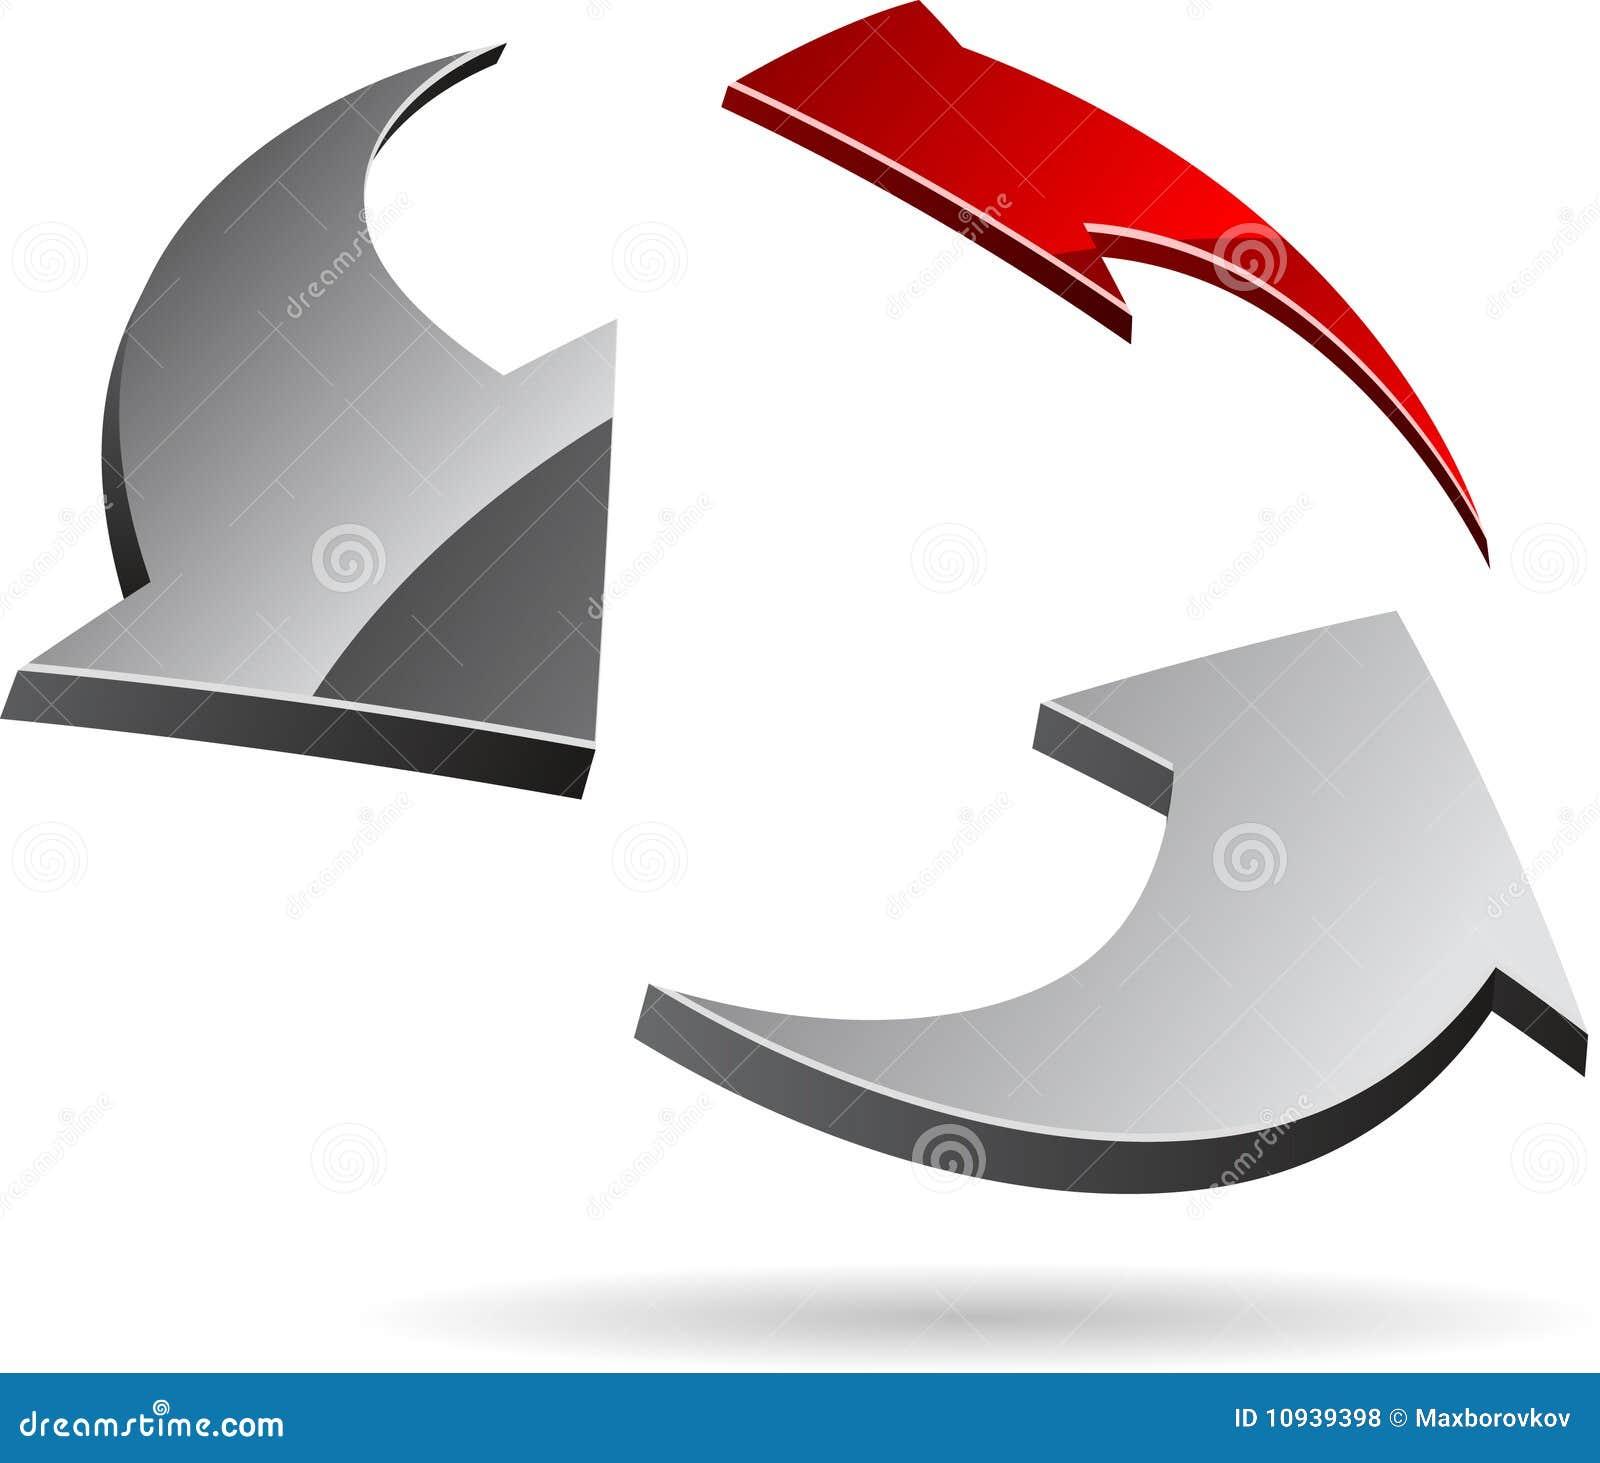 символ компании